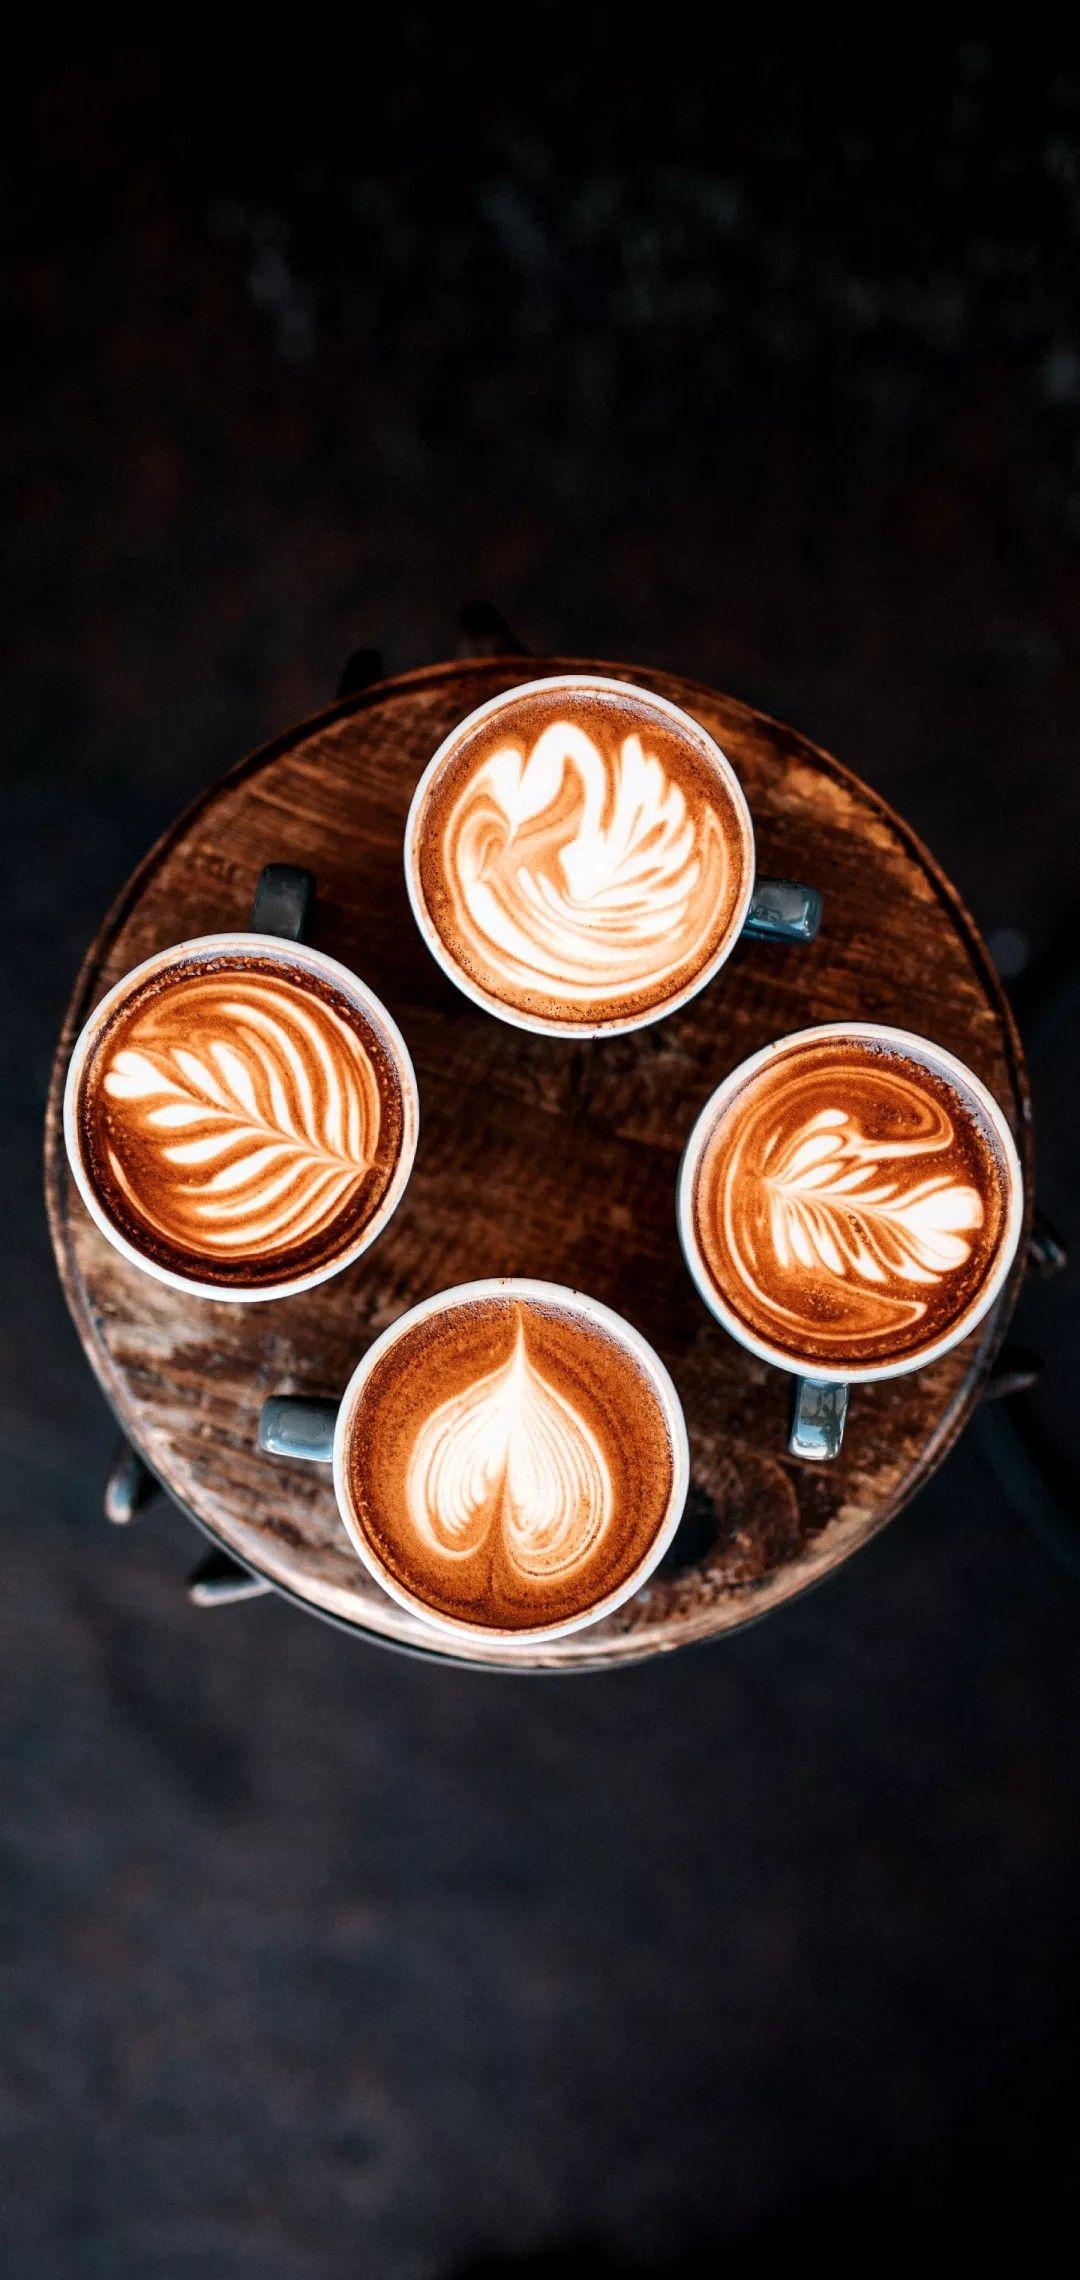 Homemade coffee creamer by Liu DingMing on Design material